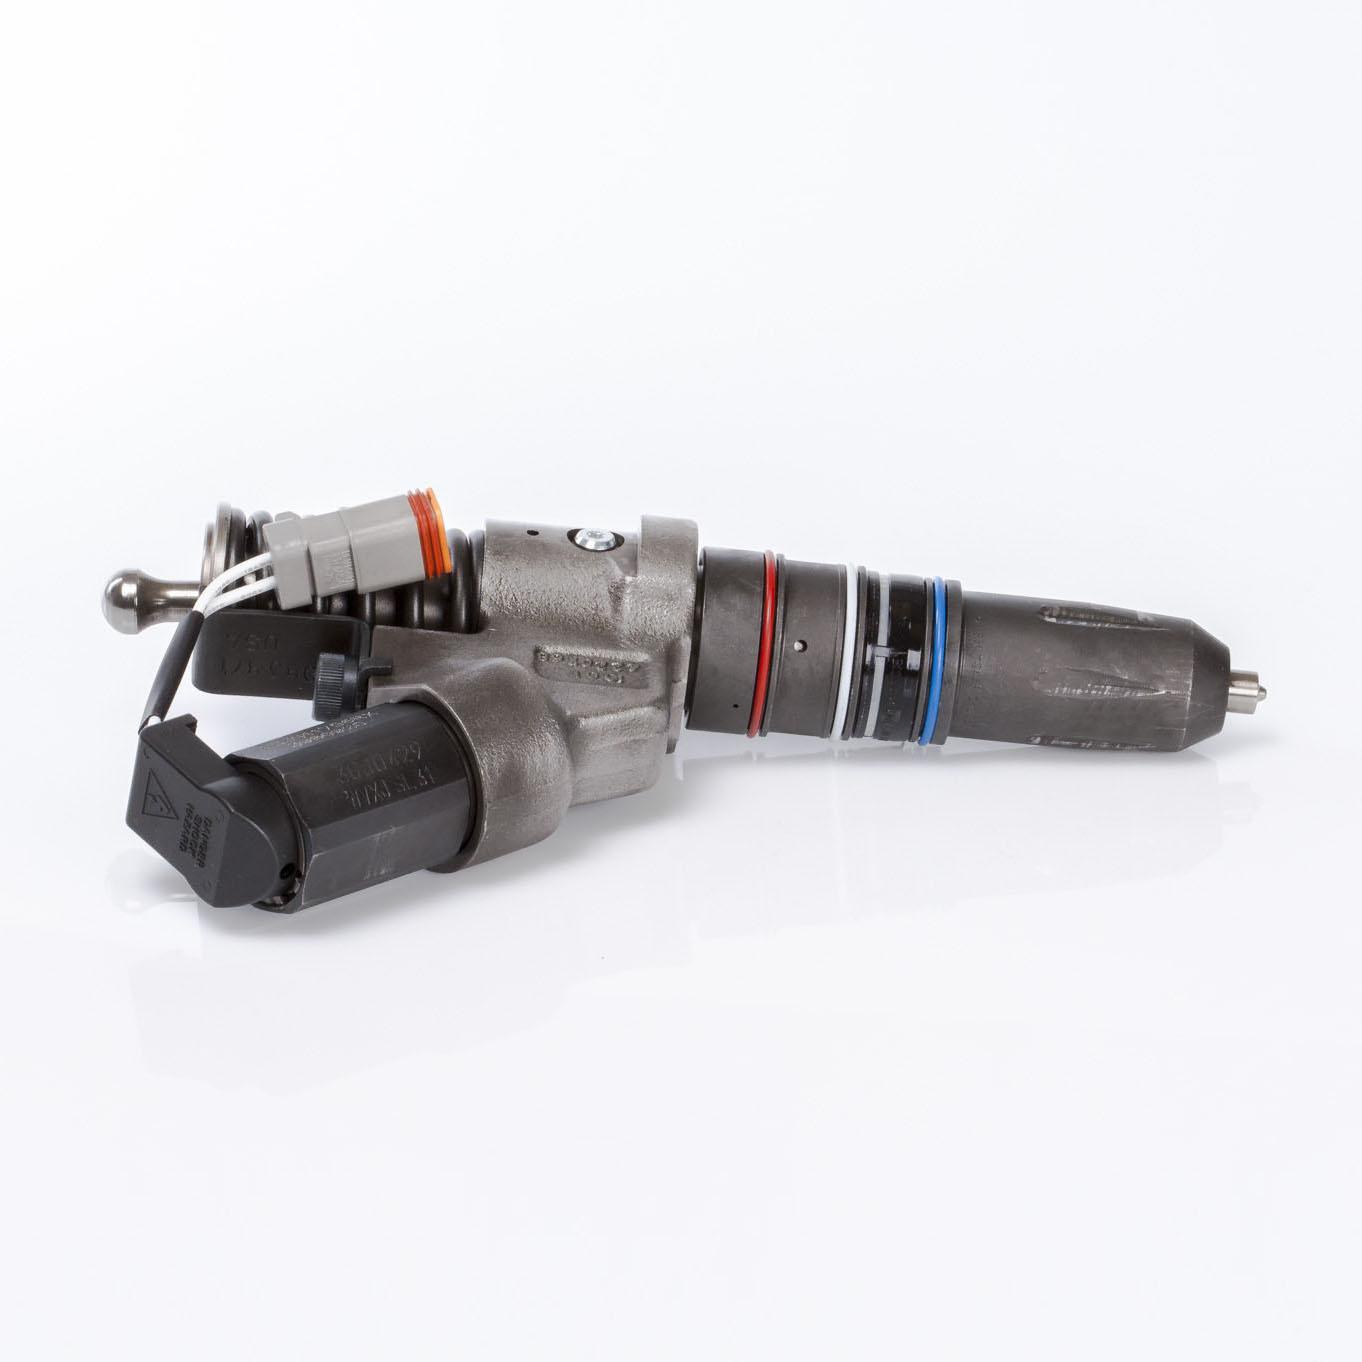 Cummins Celect M11 Injector 3411756RX